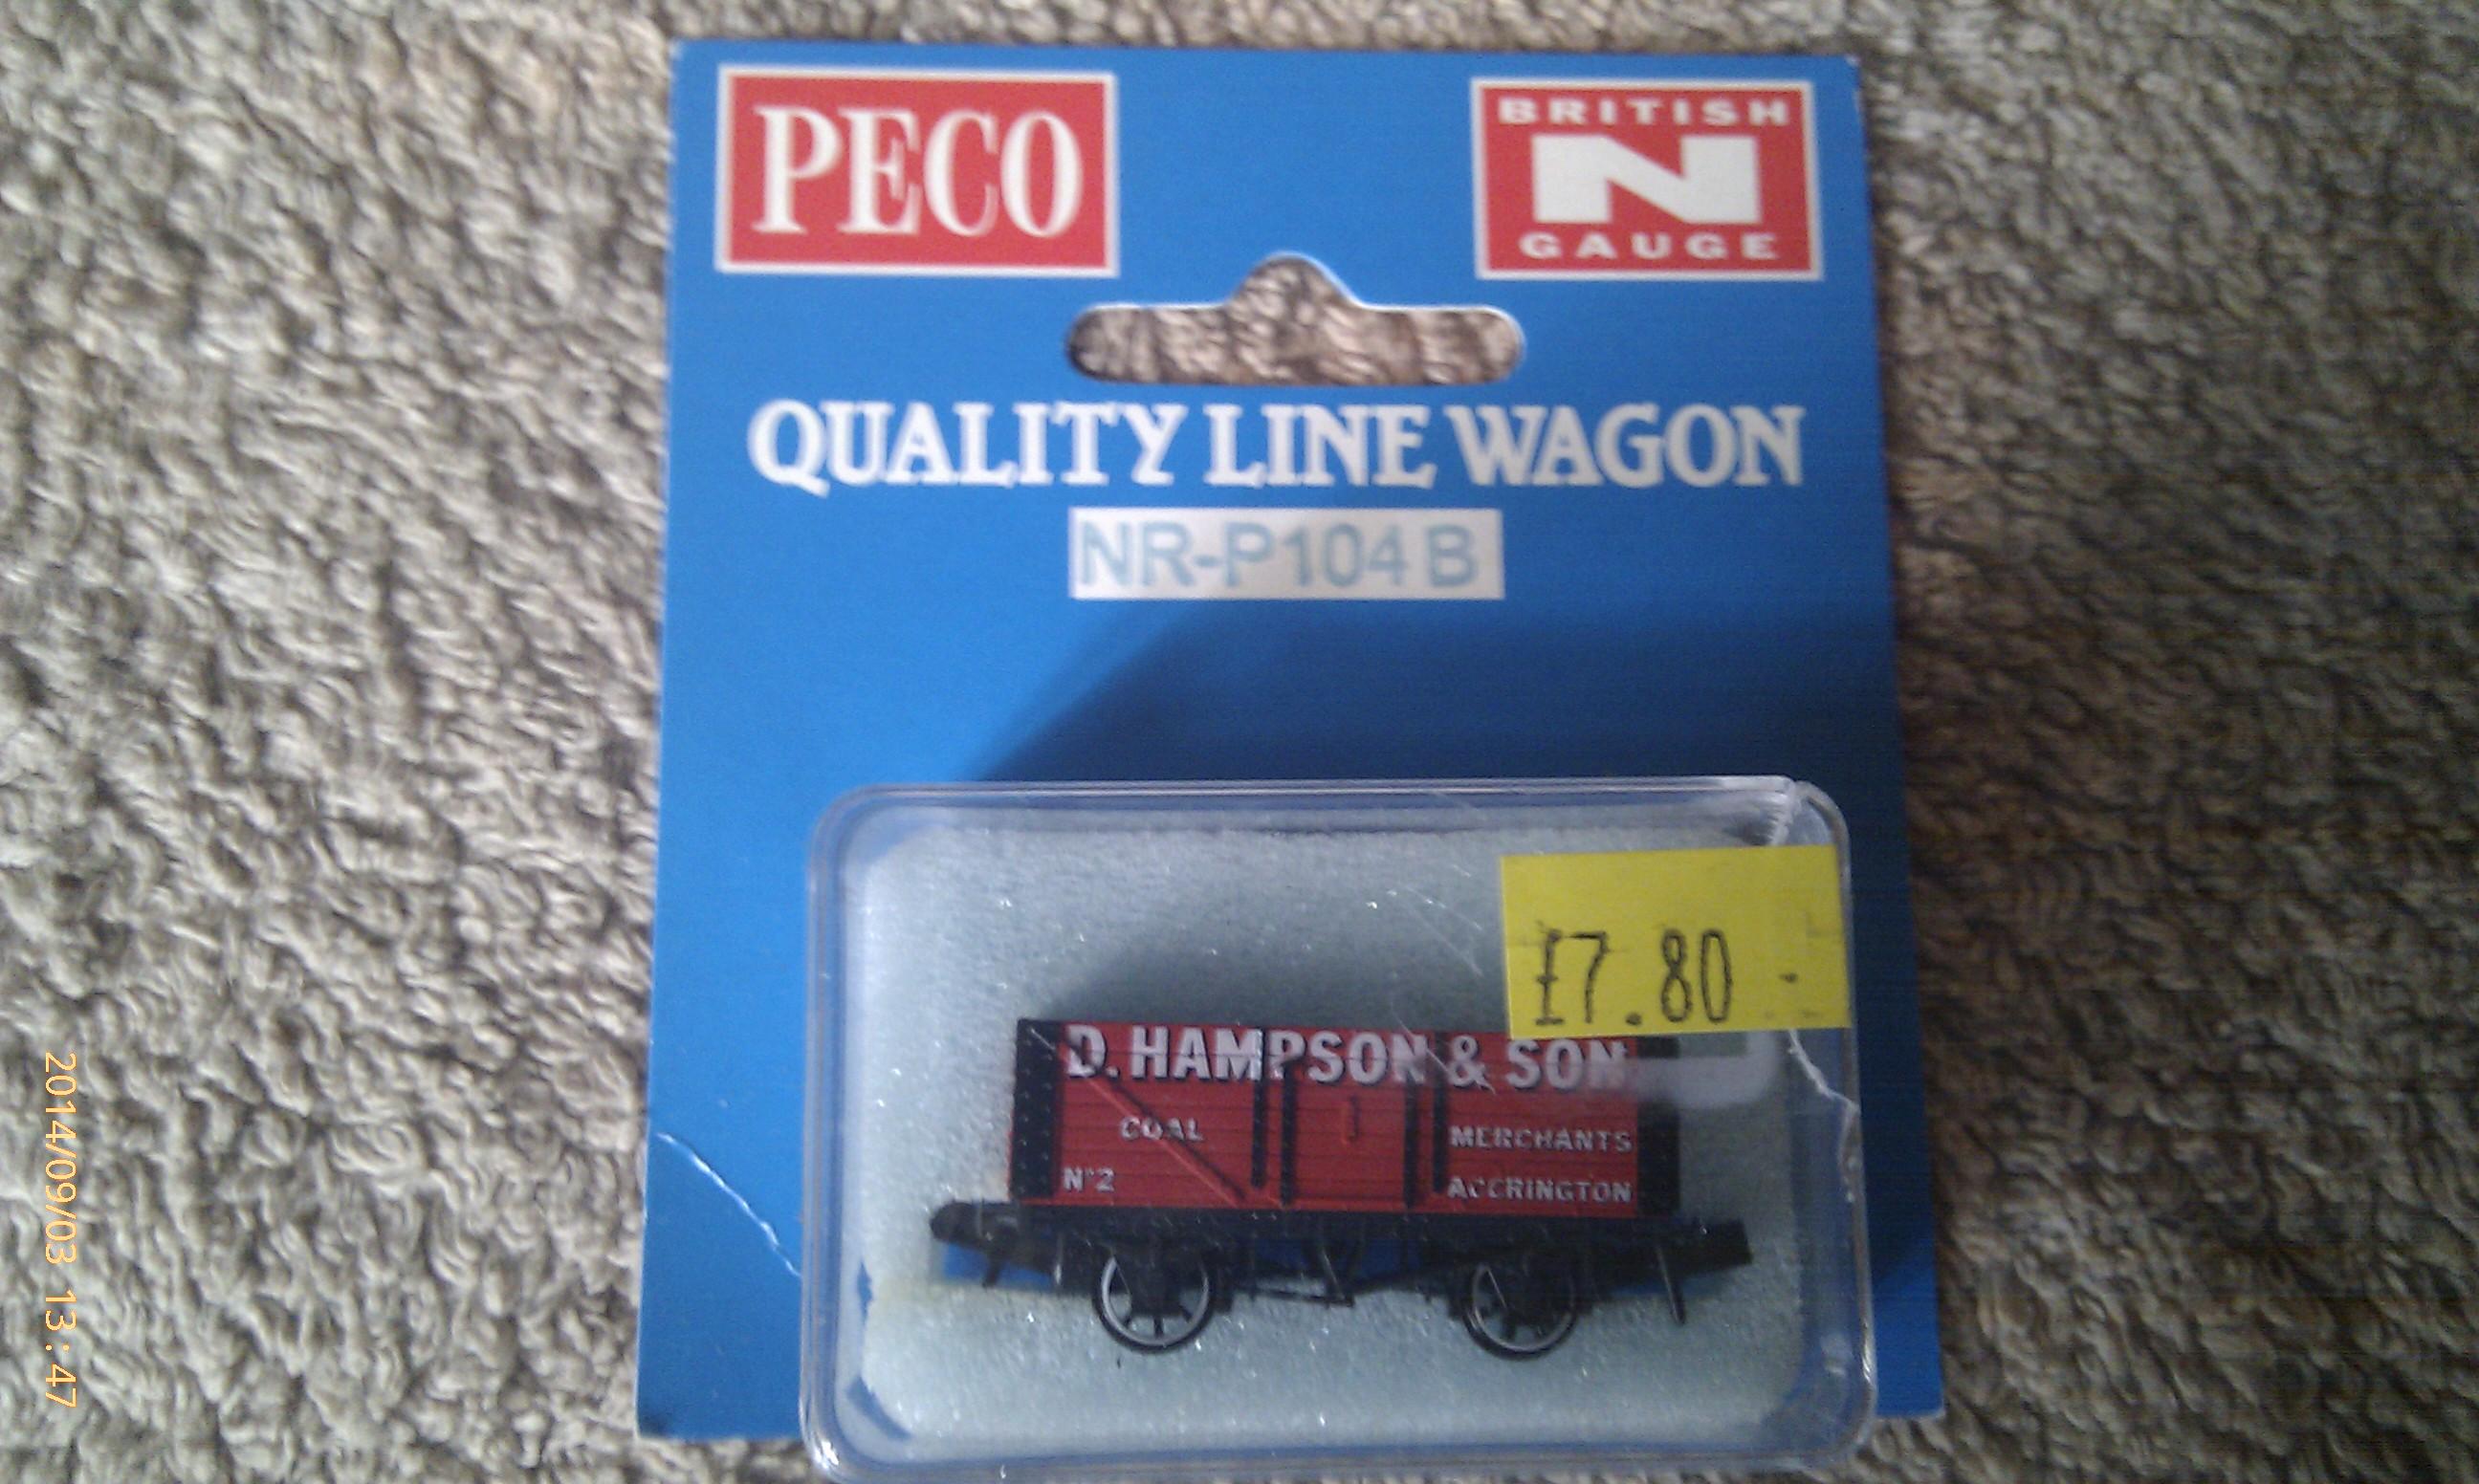 Peco Quality Line Wagon NR-P104B D Hampson & Son